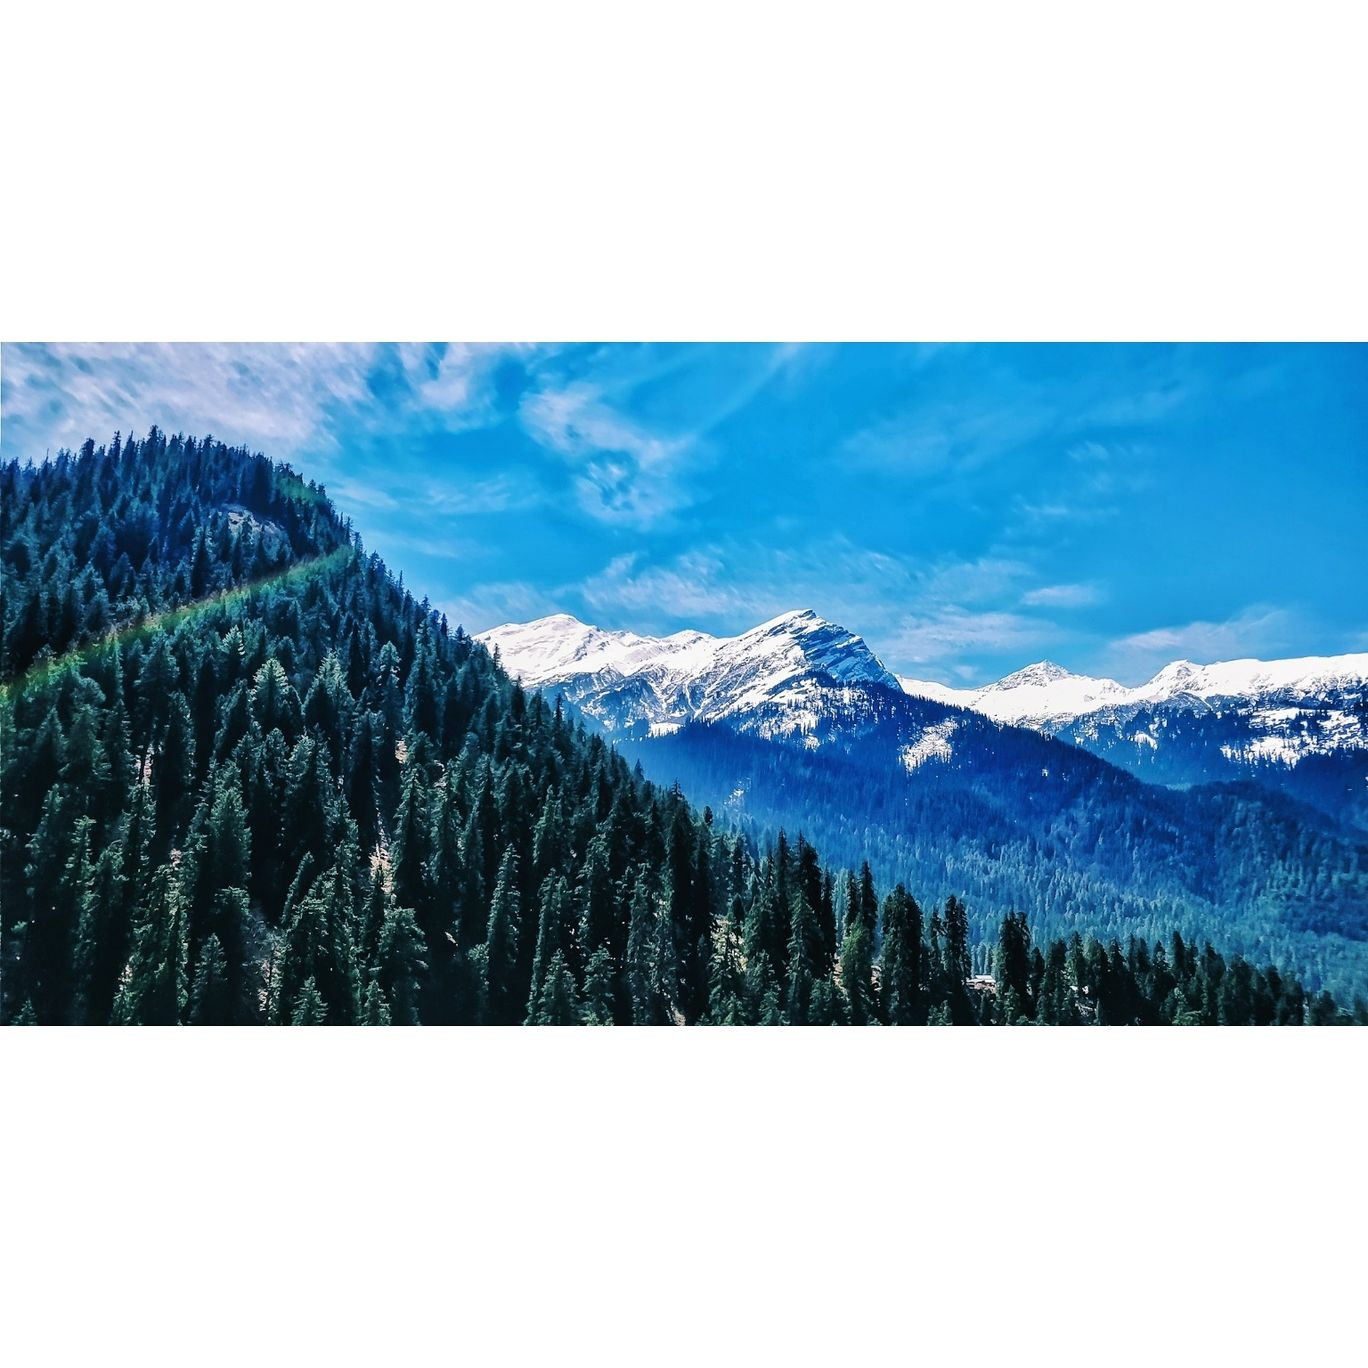 Photo of Himachal Pradesh By Shreyas Kc